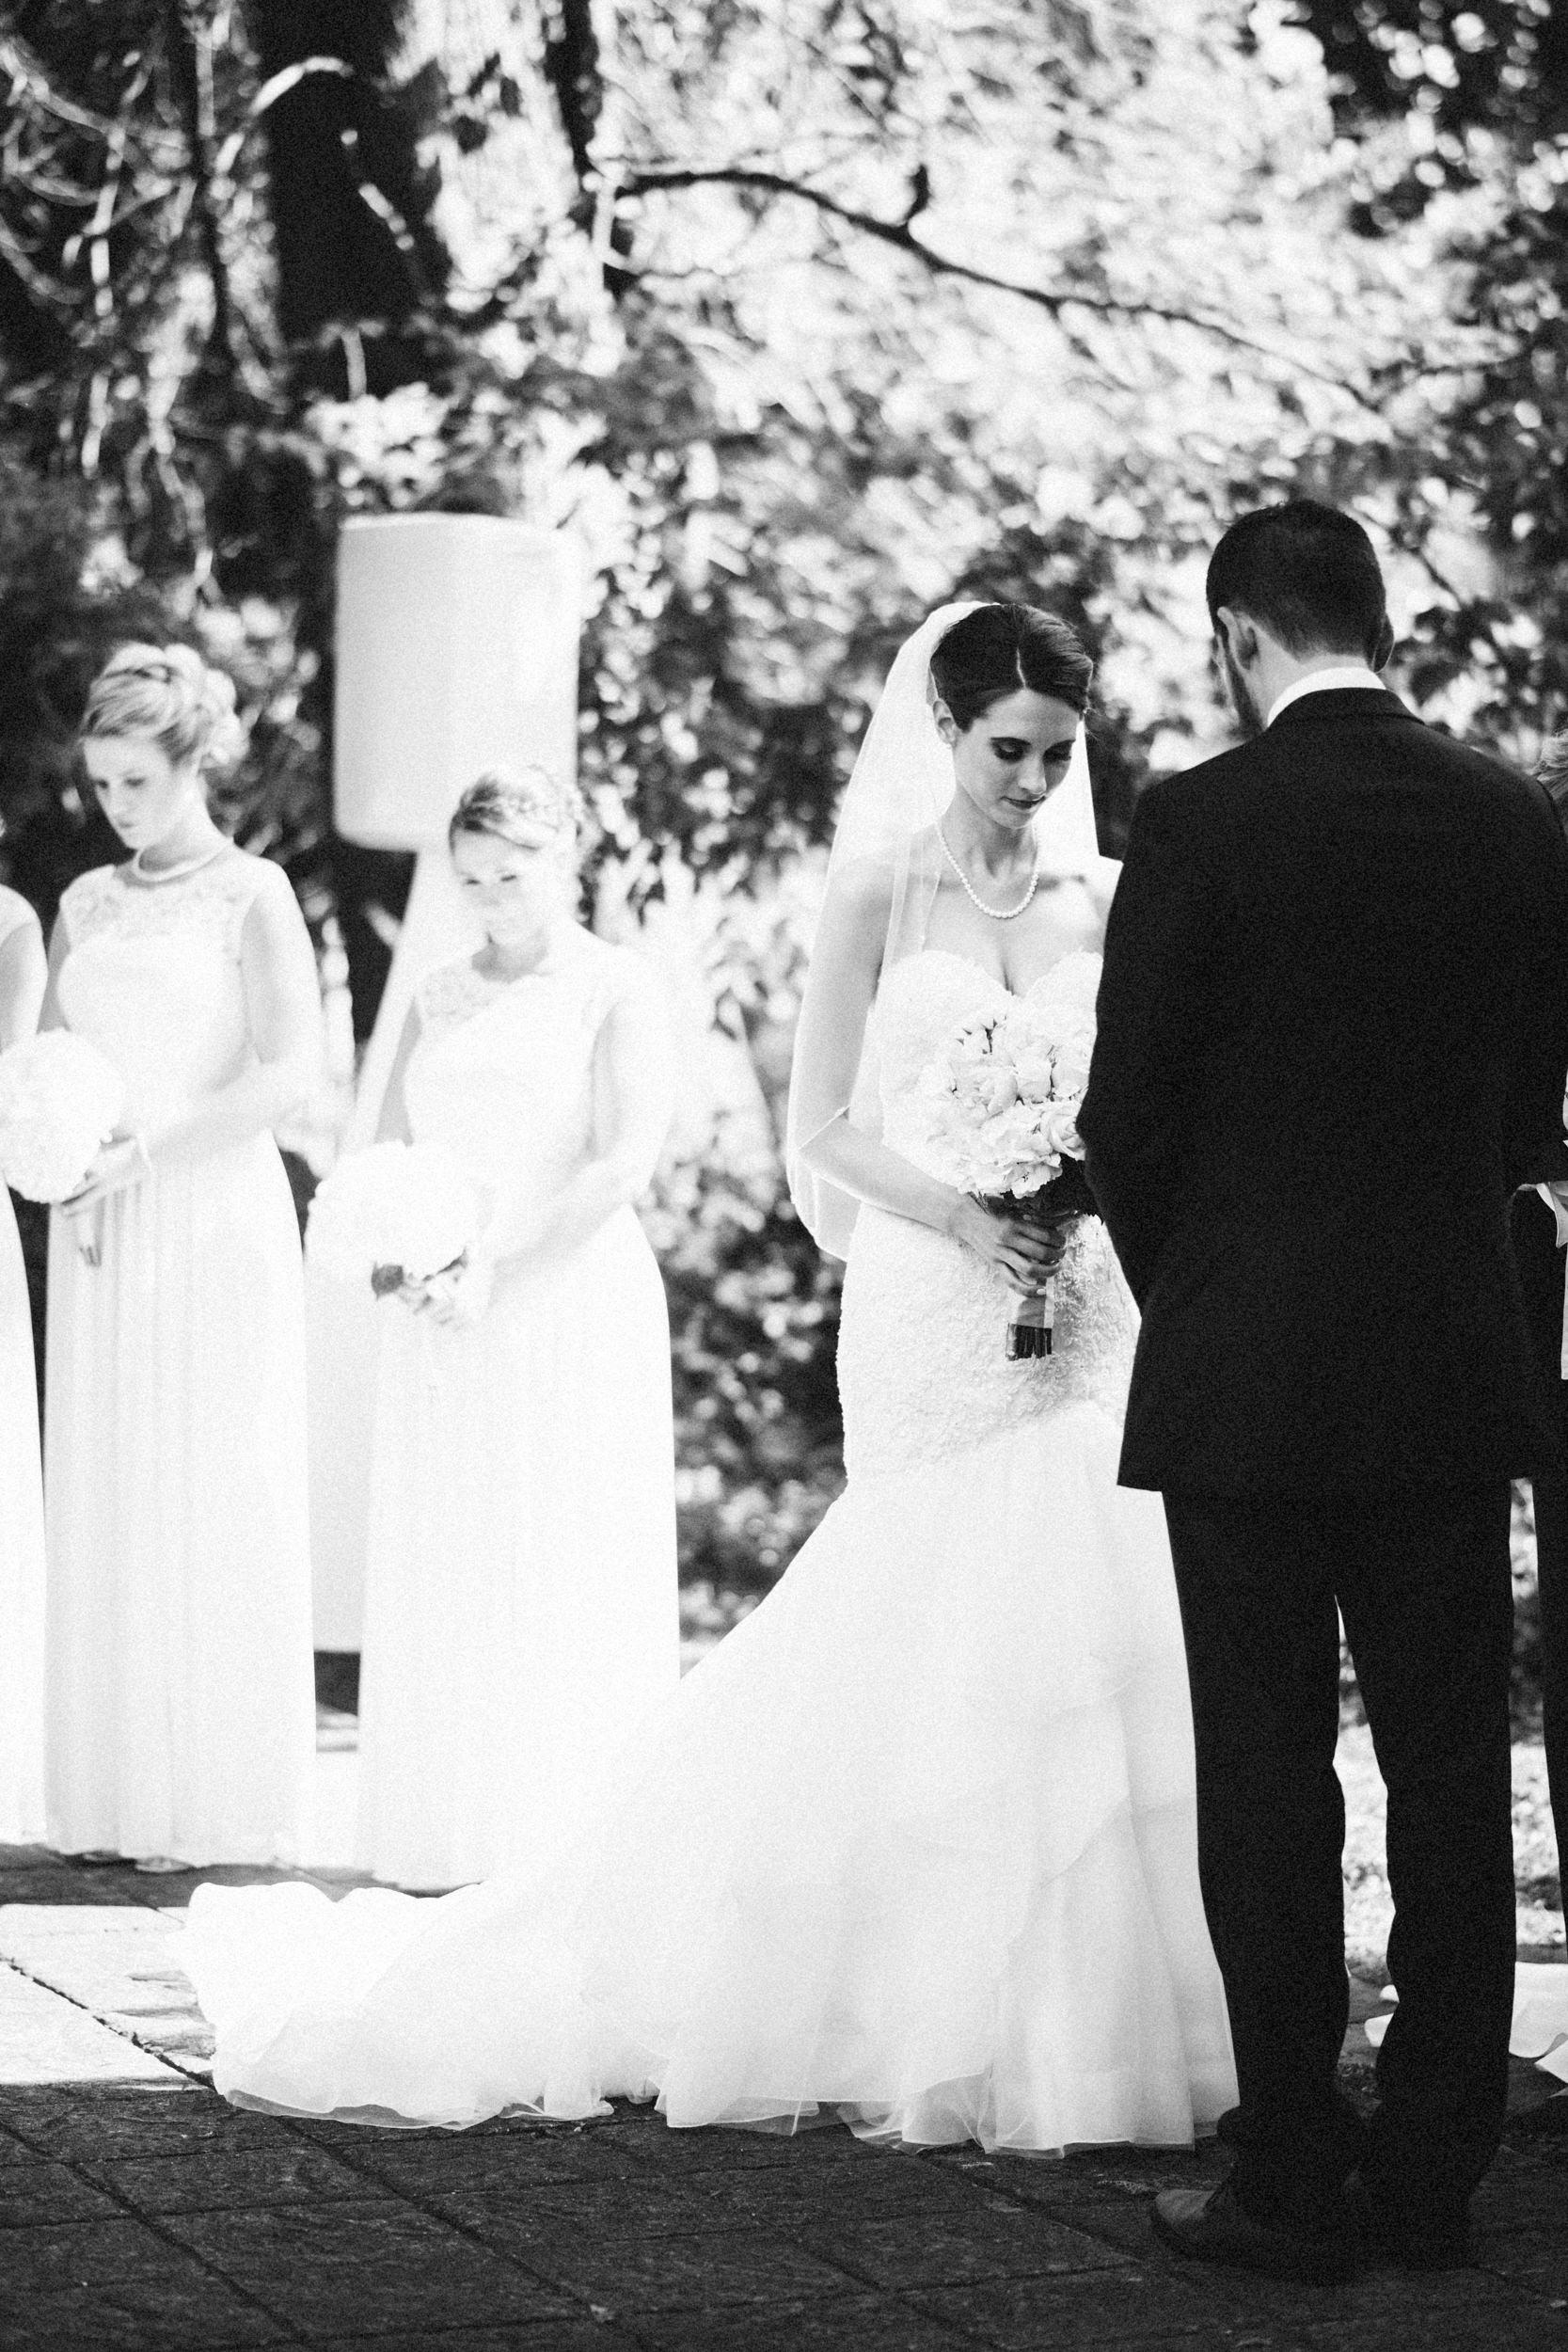 Louisville-Kentucky-Wedding-Elopement-Photographer-Sarah-Katherine-Davis-Photography-Whitehall-Classic-Timeless-Garden-Wedding-342.jpg